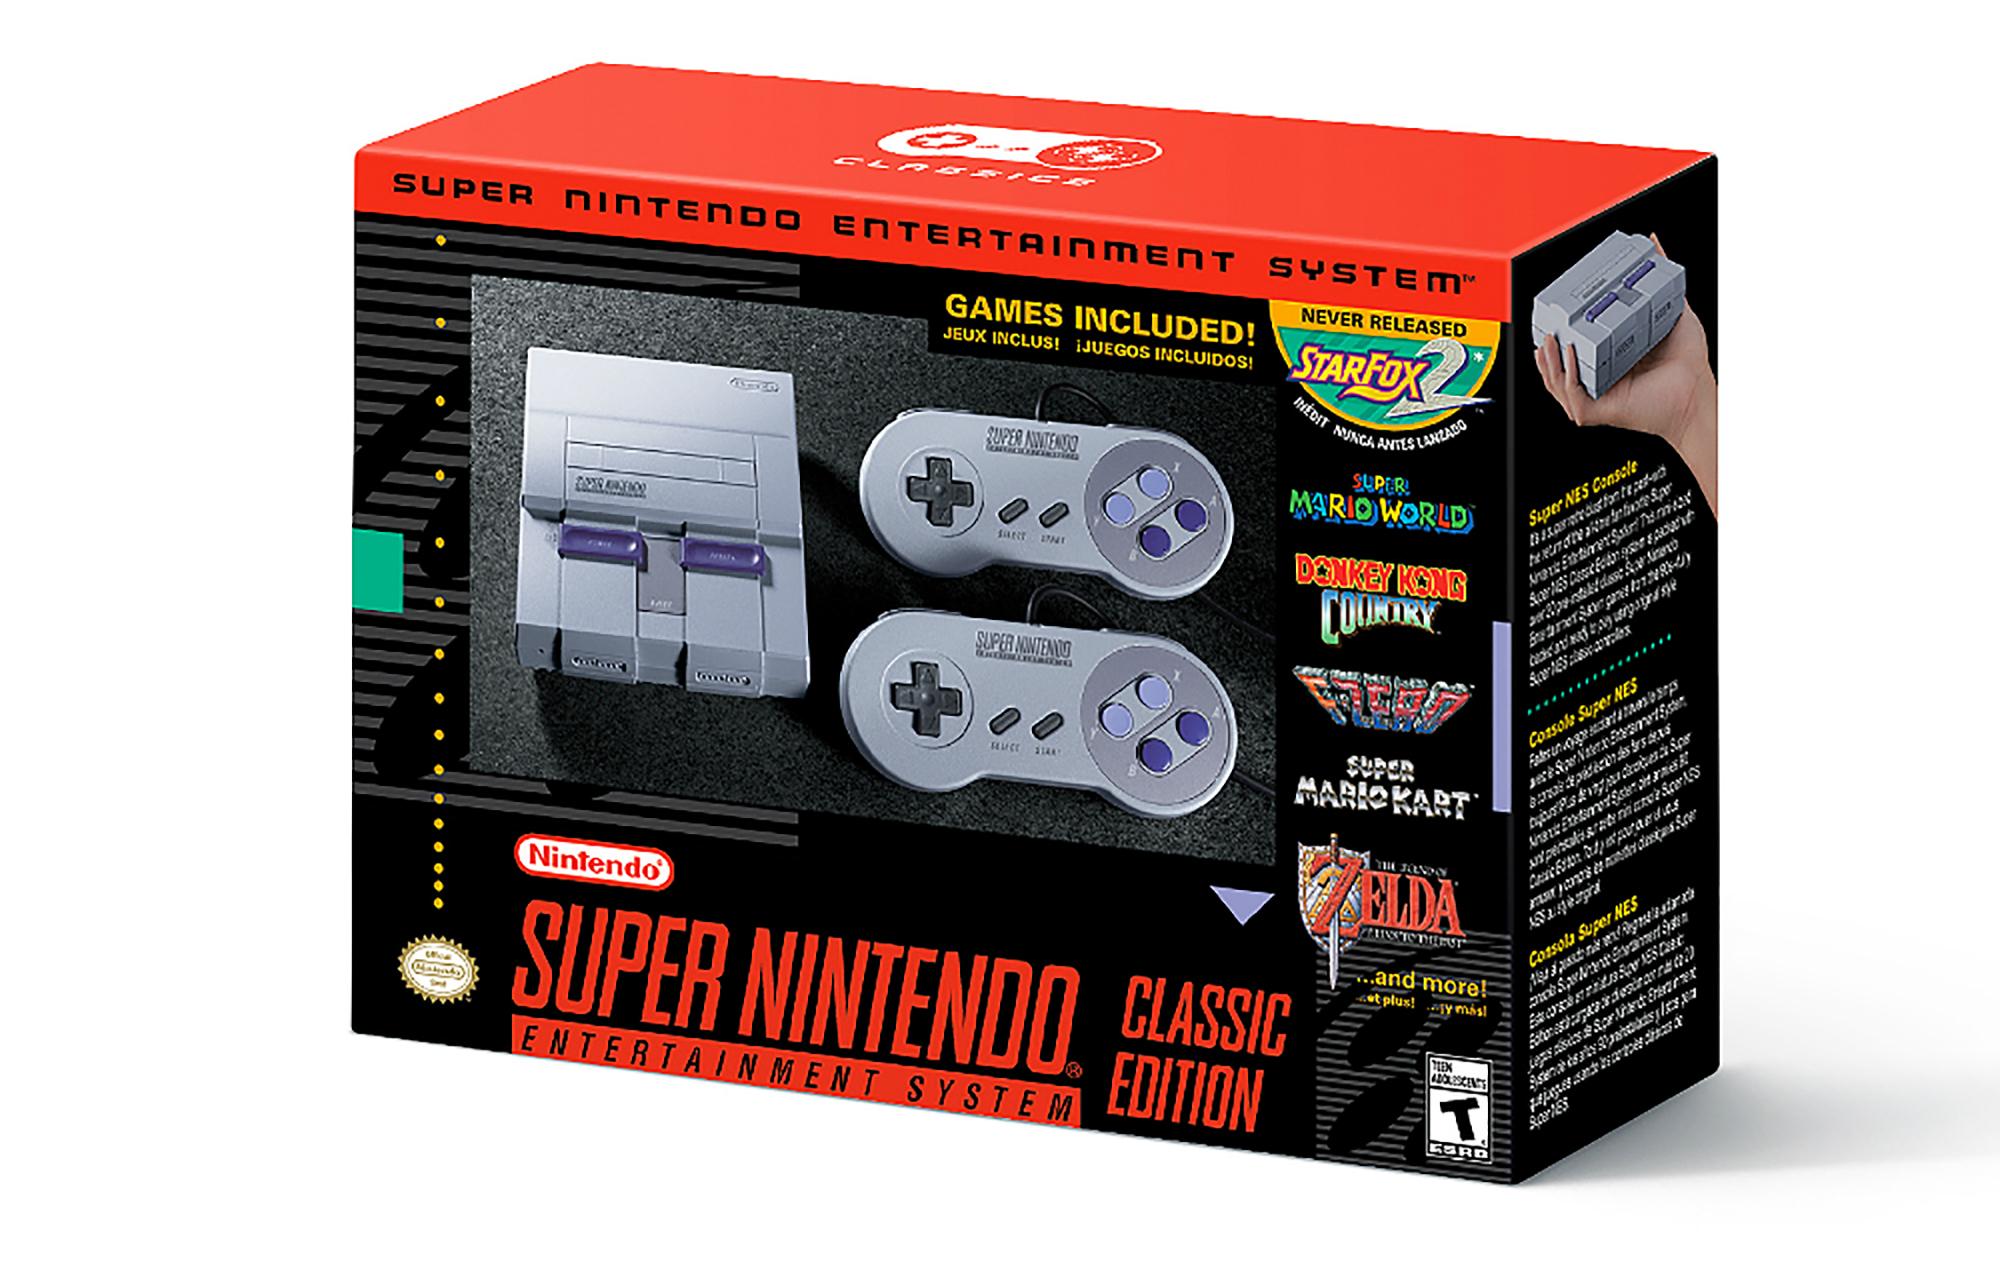 The Nintendo SNES Classic Edition 2017